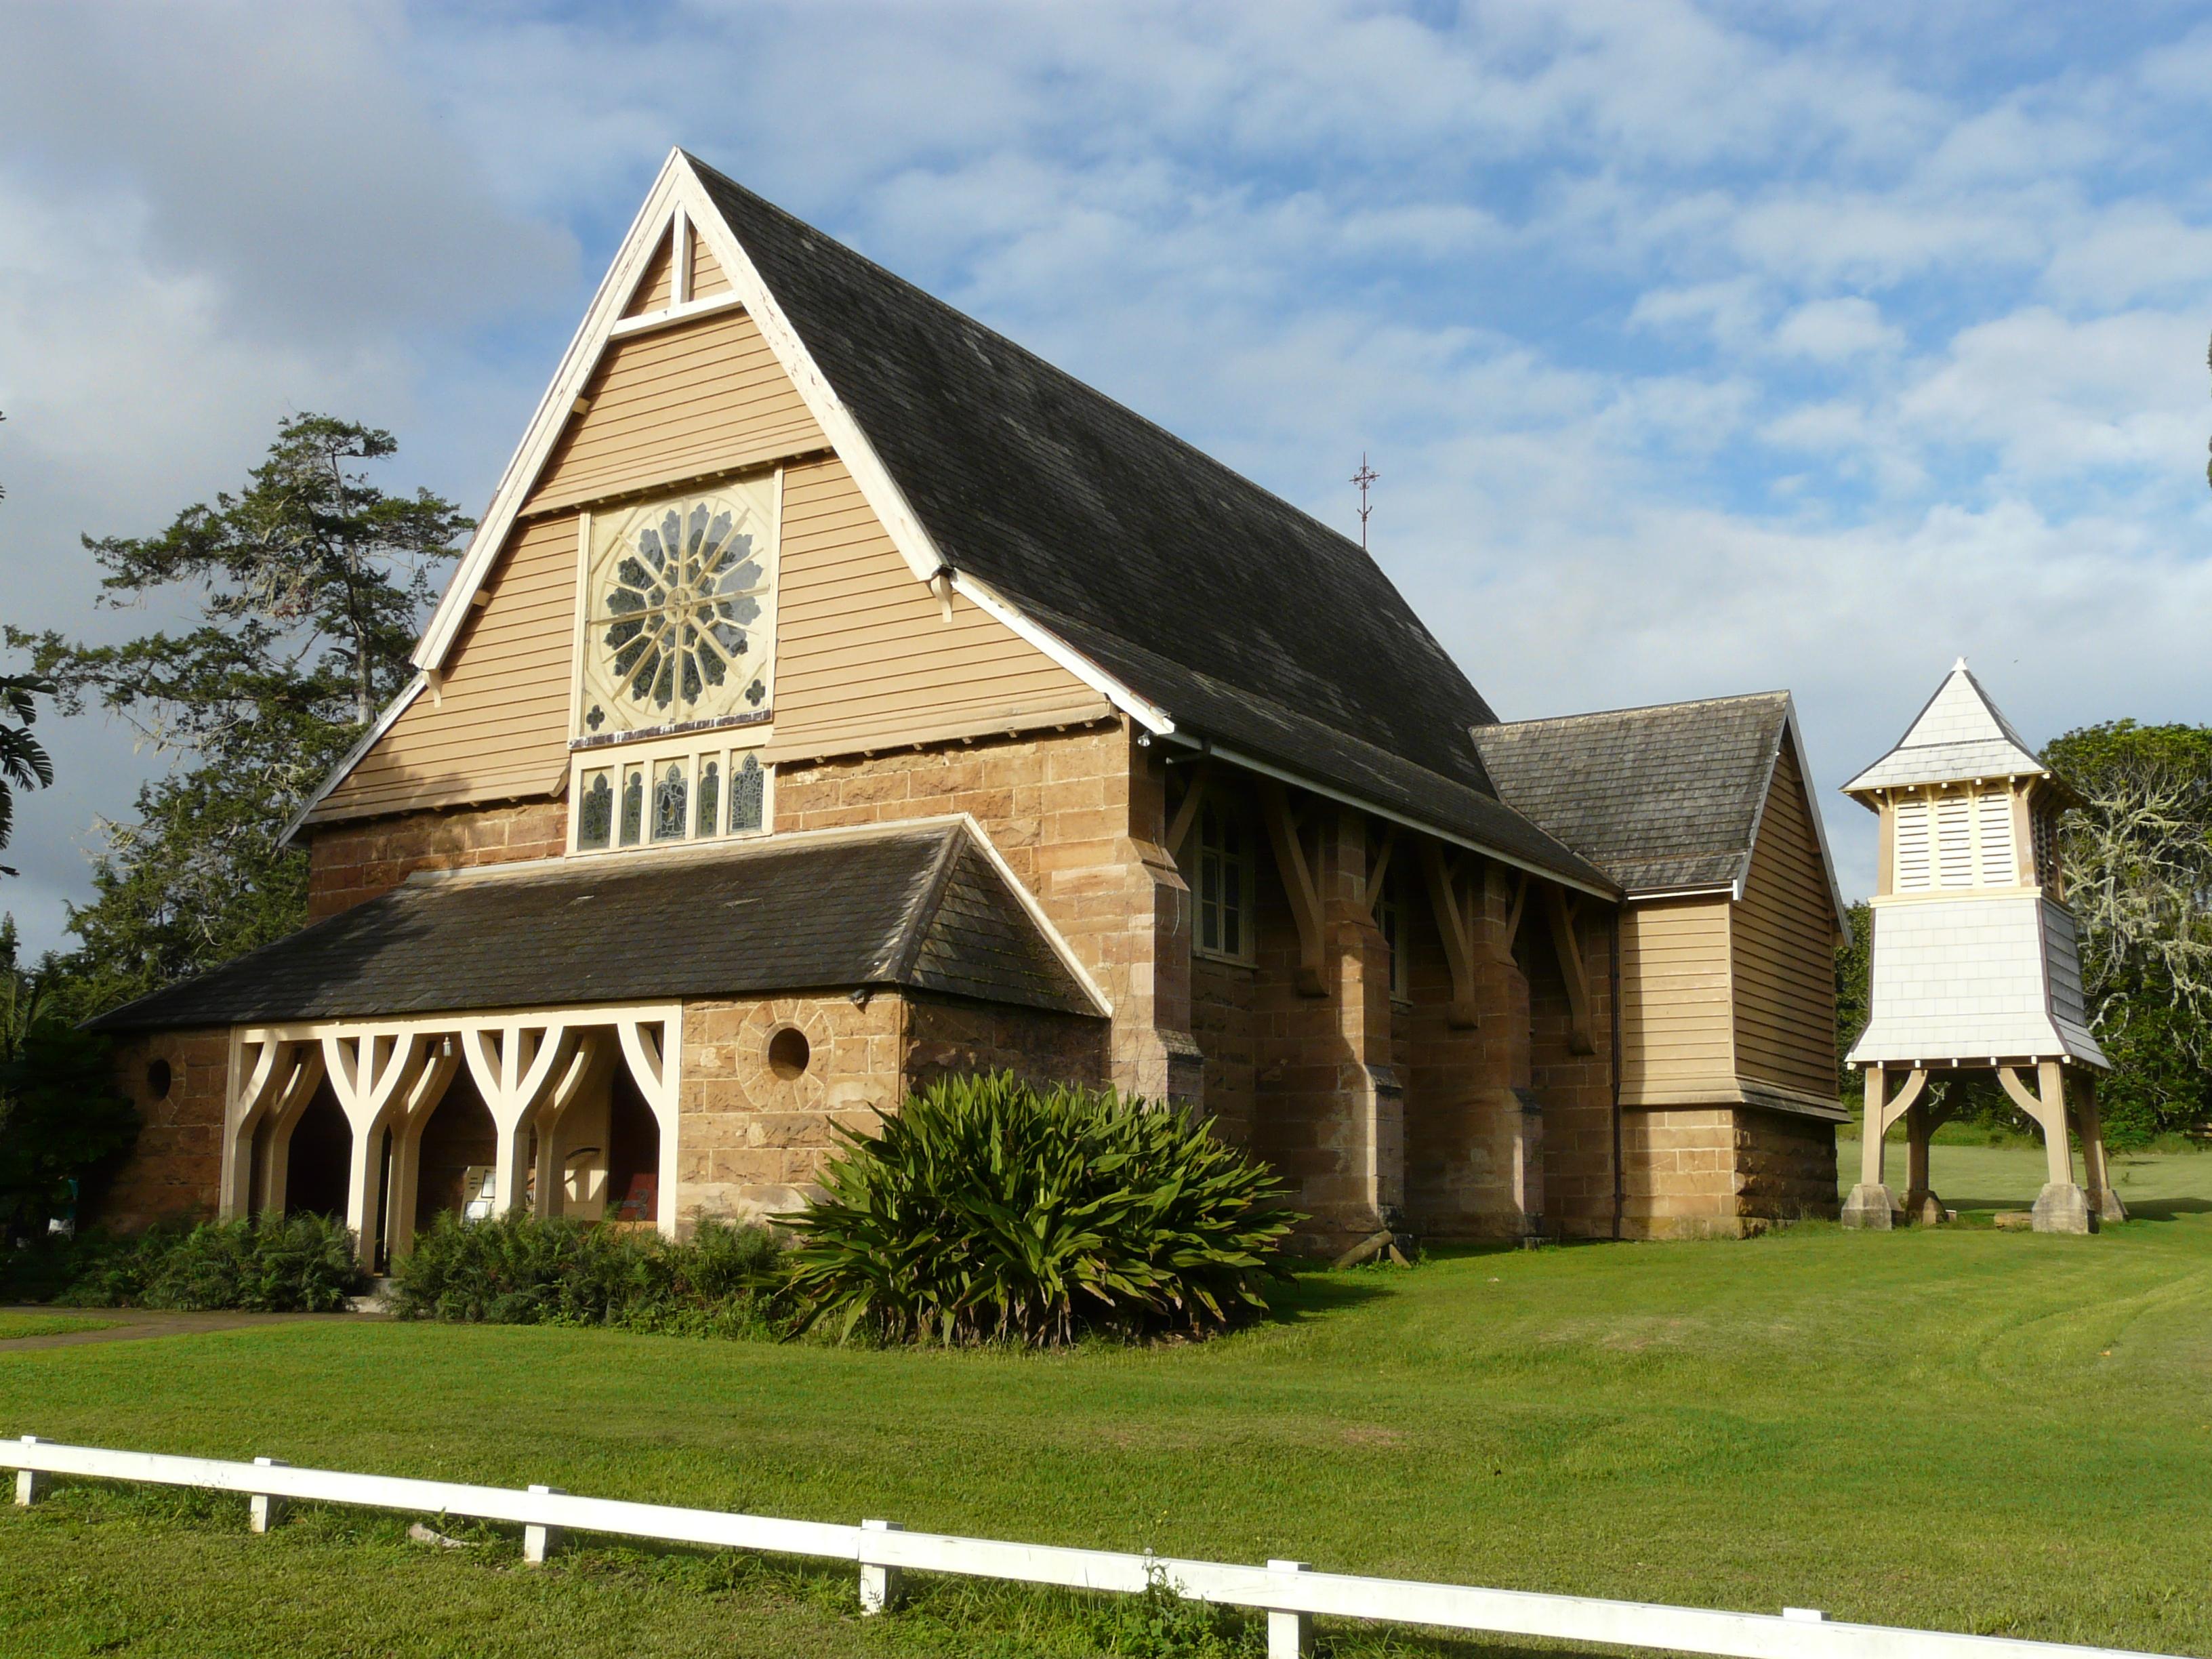 St Barnabas Anglican Church on Norfolk Island. Photo taken on April 21, 2008.